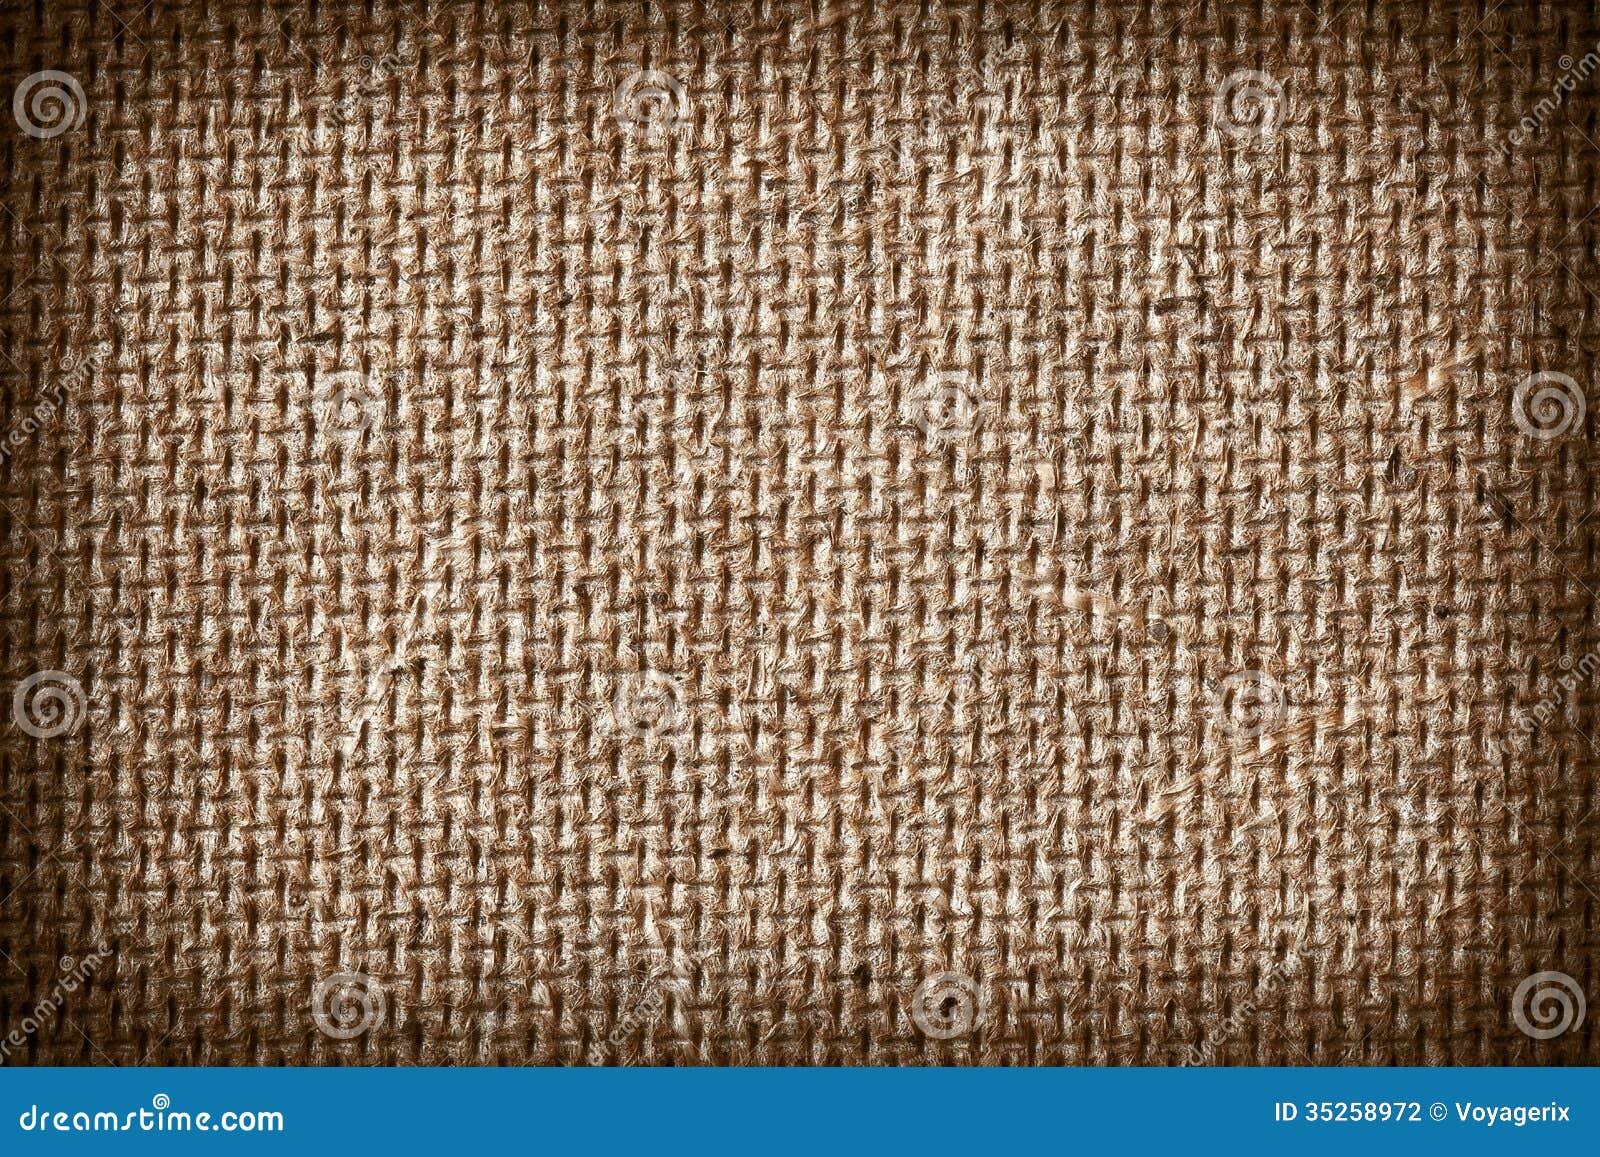 Brown fiberboard hardboard texture background stock photo